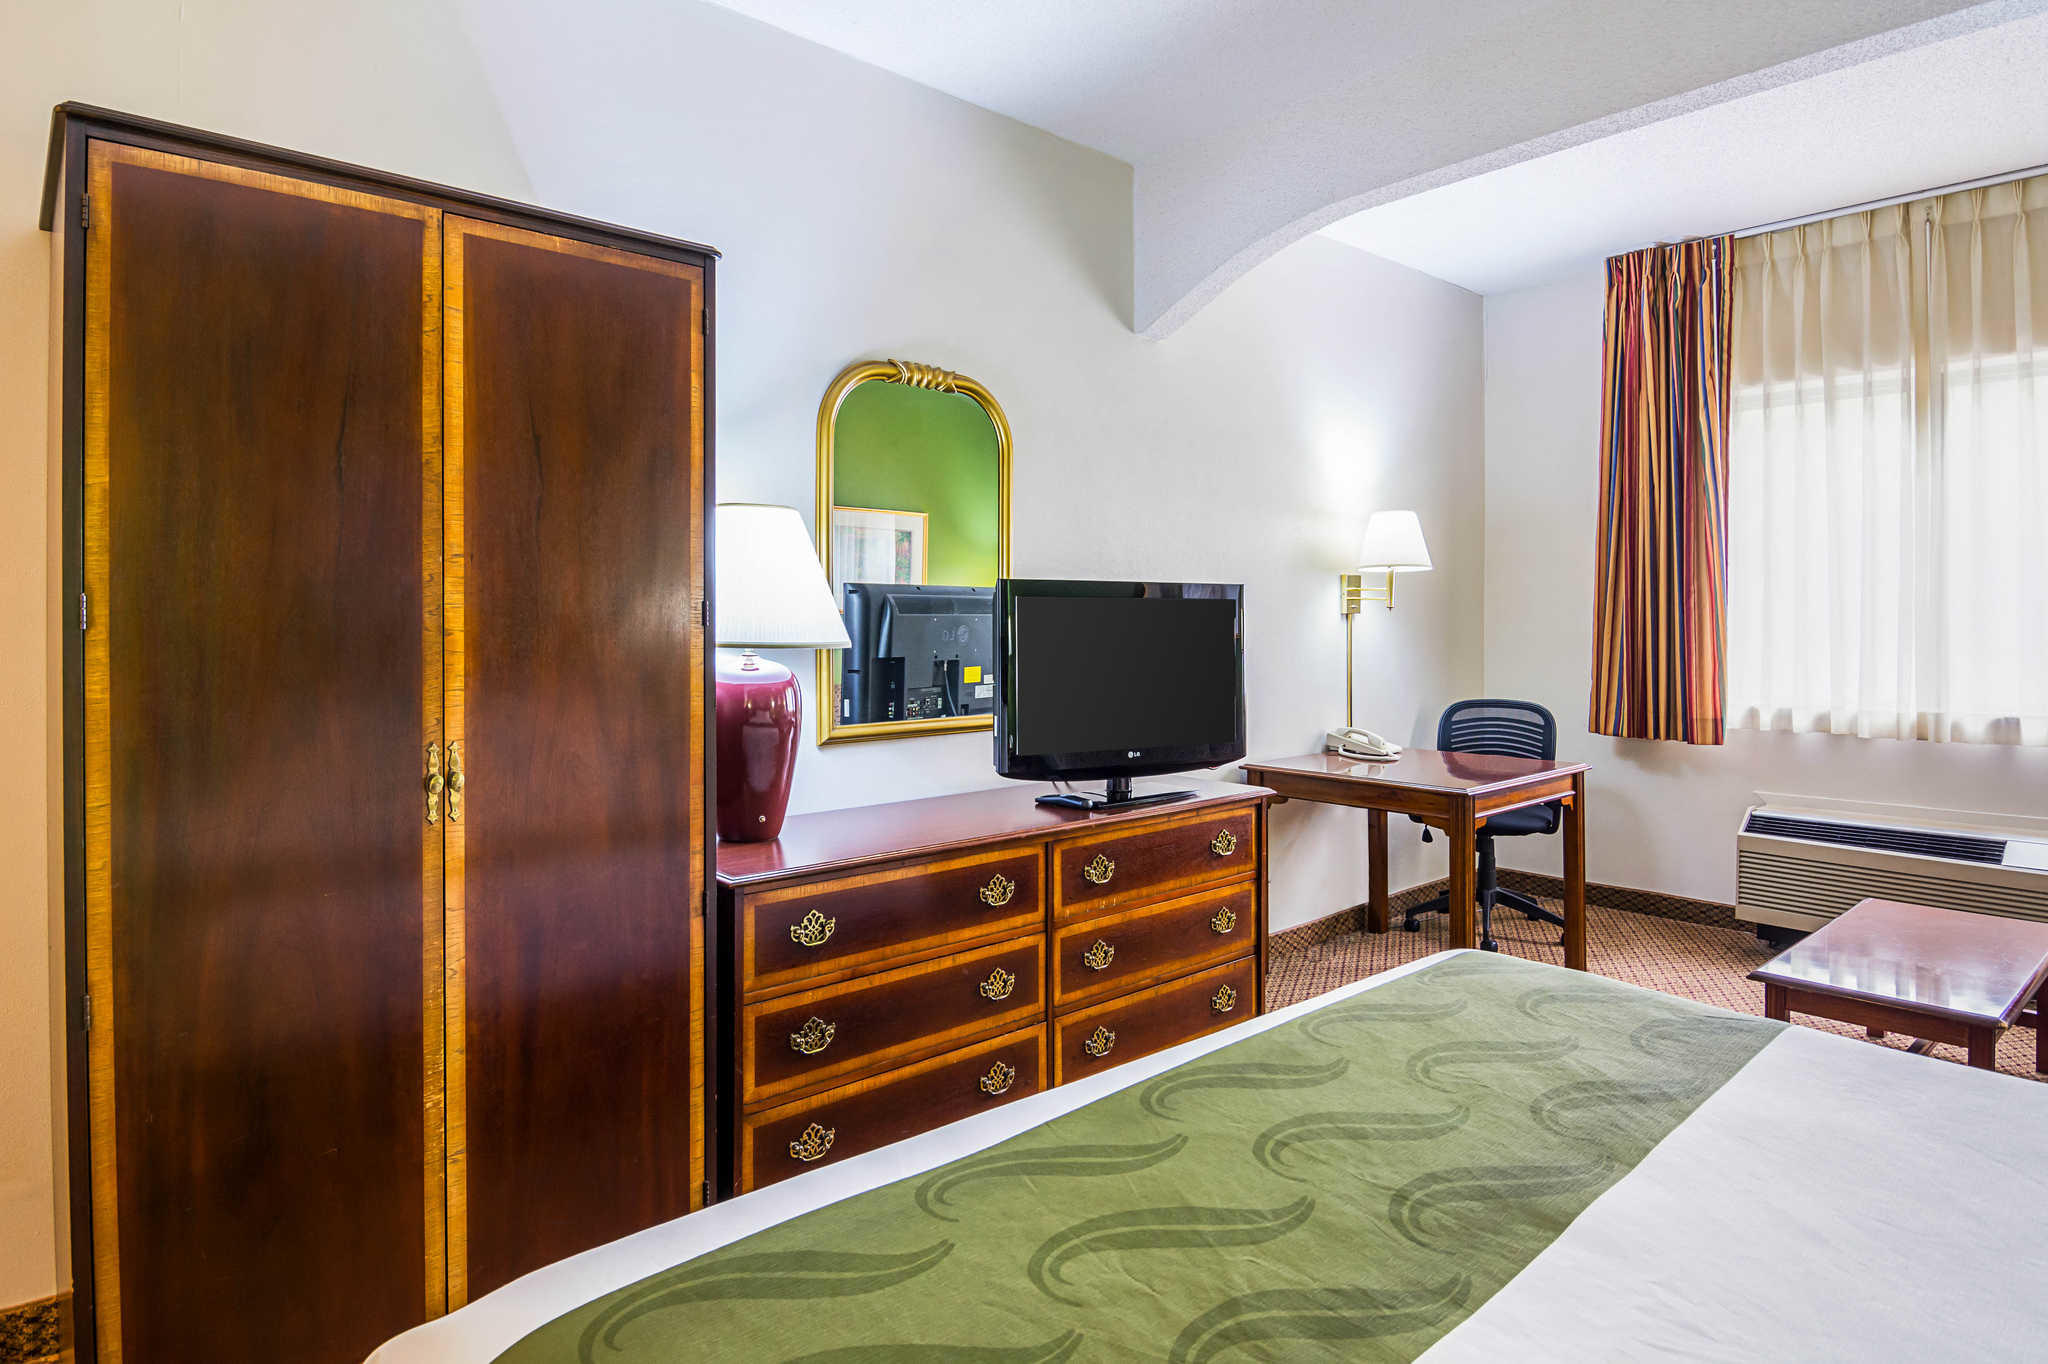 Quality Inn & Suites Kearneysville - Martinsburg image 16